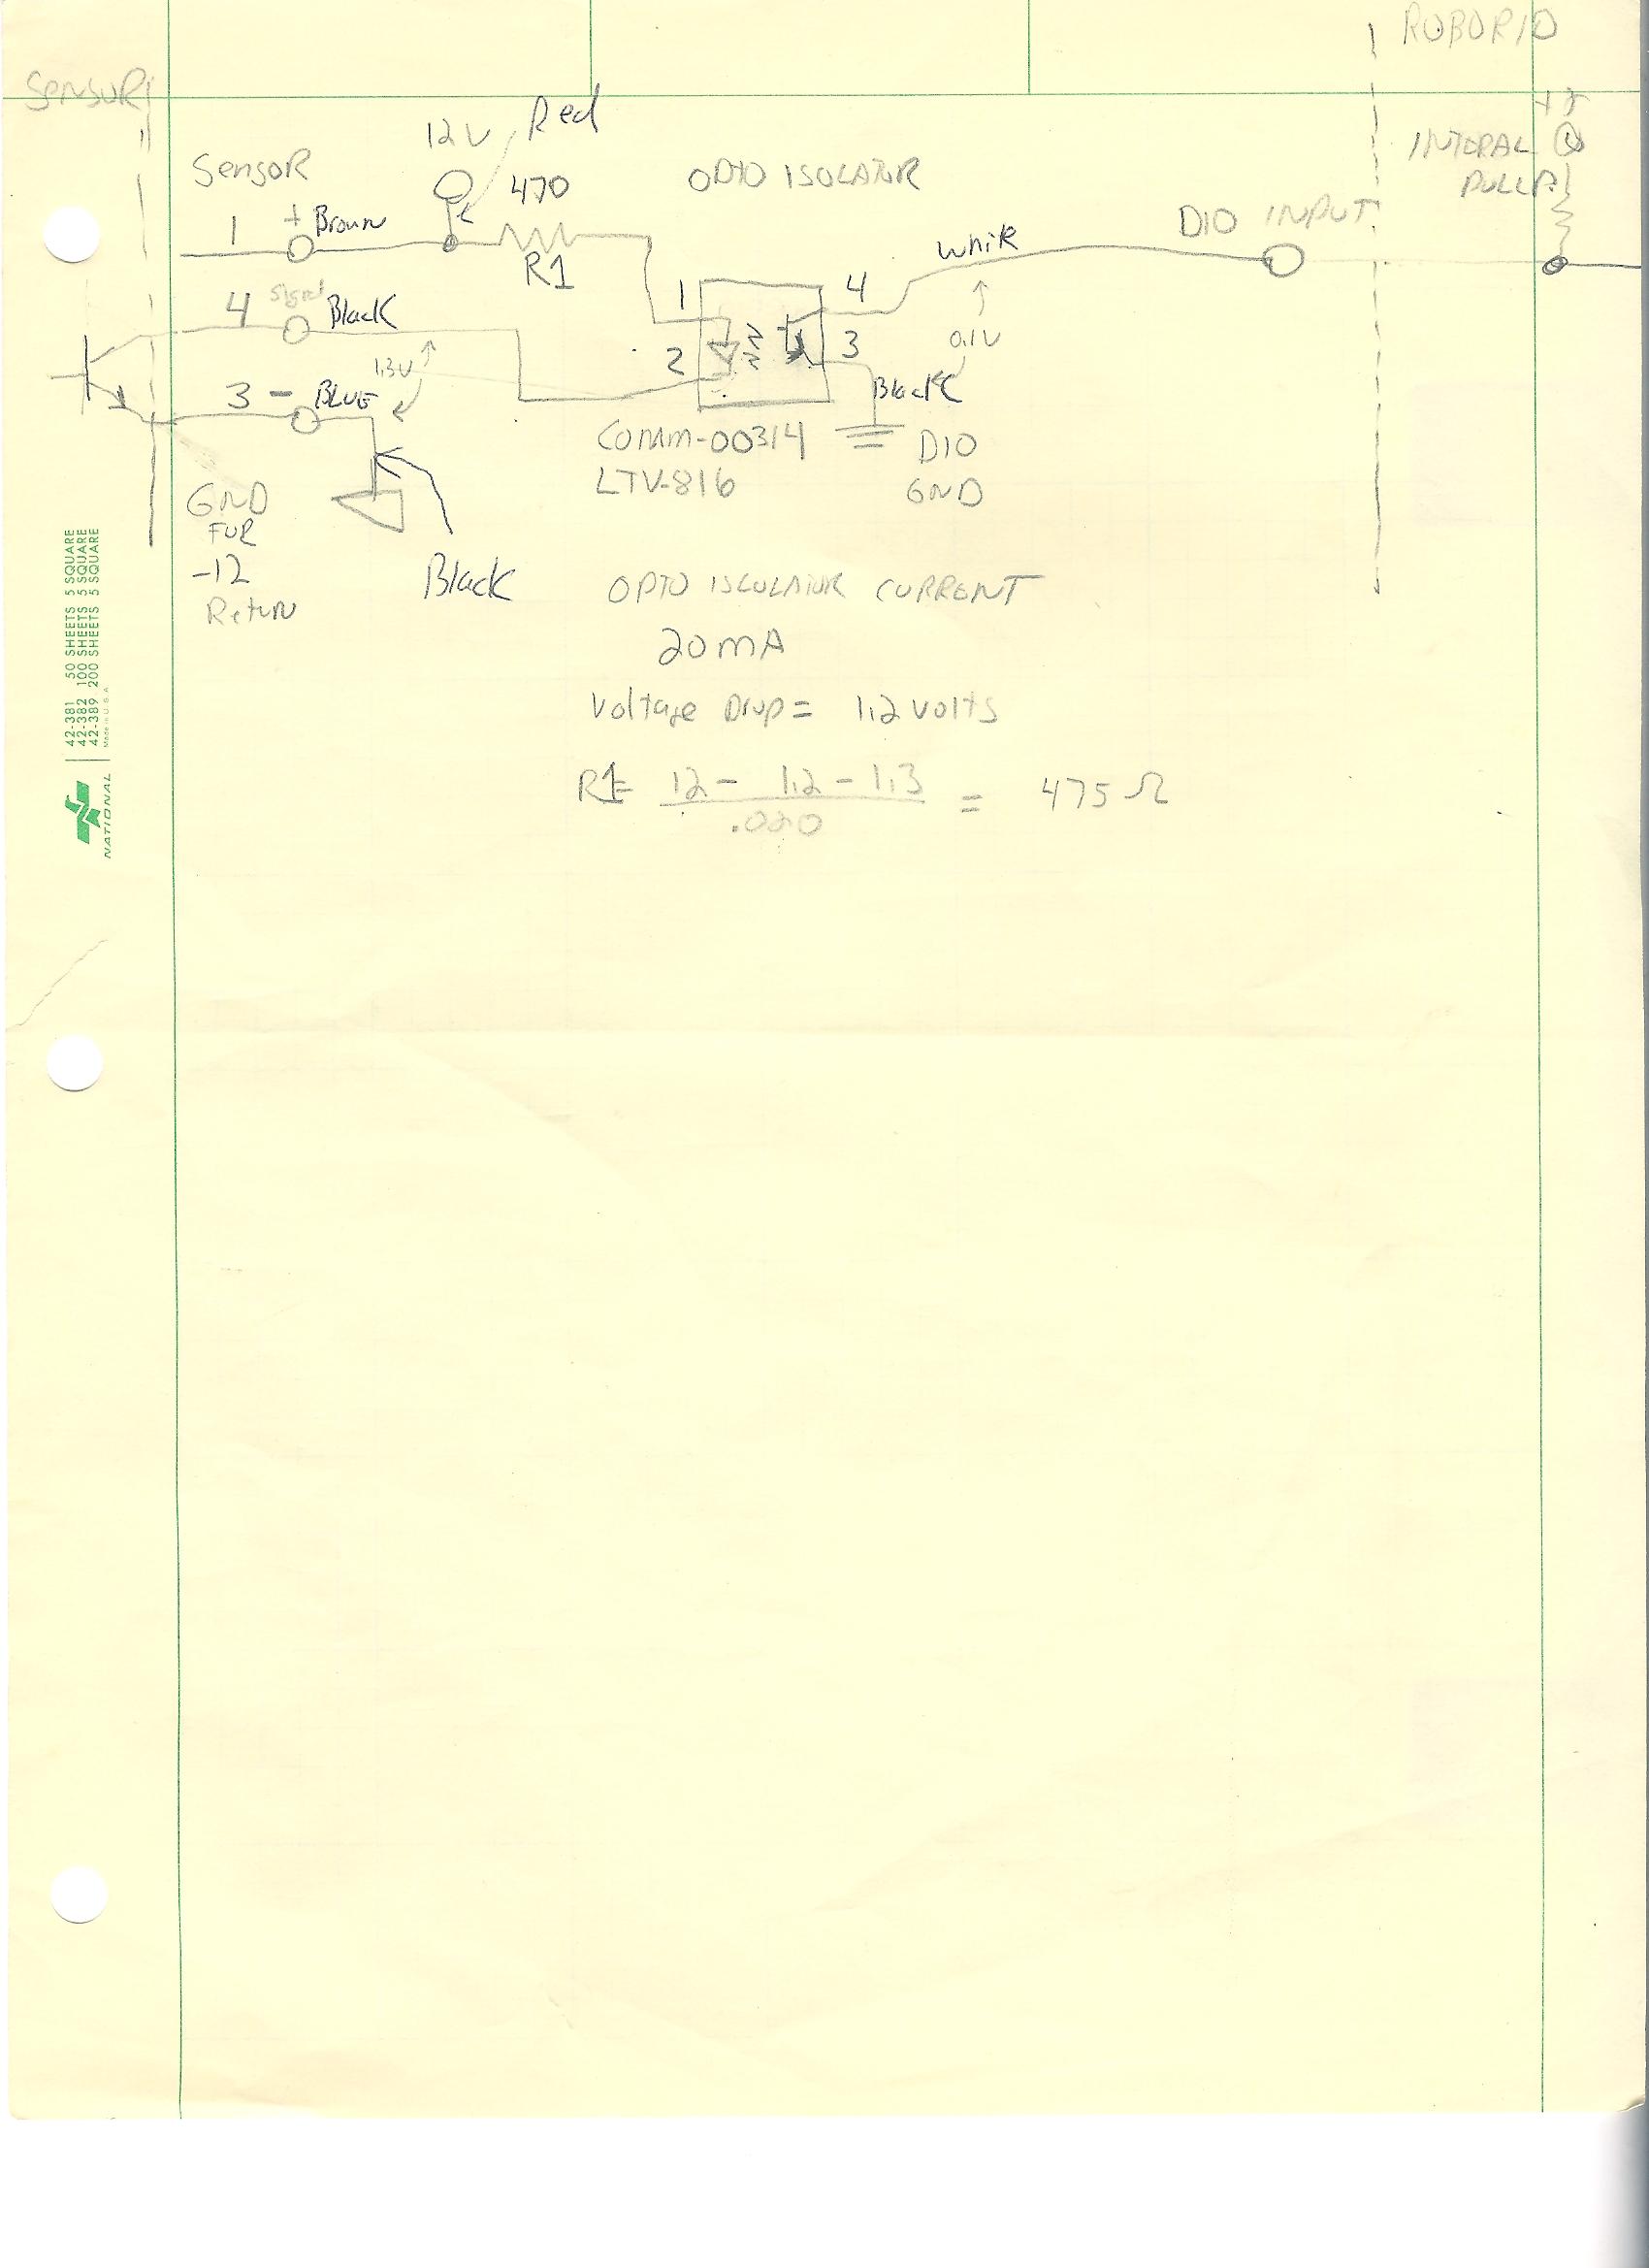 Superb Qs18Vn6Lp Wiring Diagram Electrical Chief Delphi Wiring Cloud Funidienstapotheekhoekschewaardnl